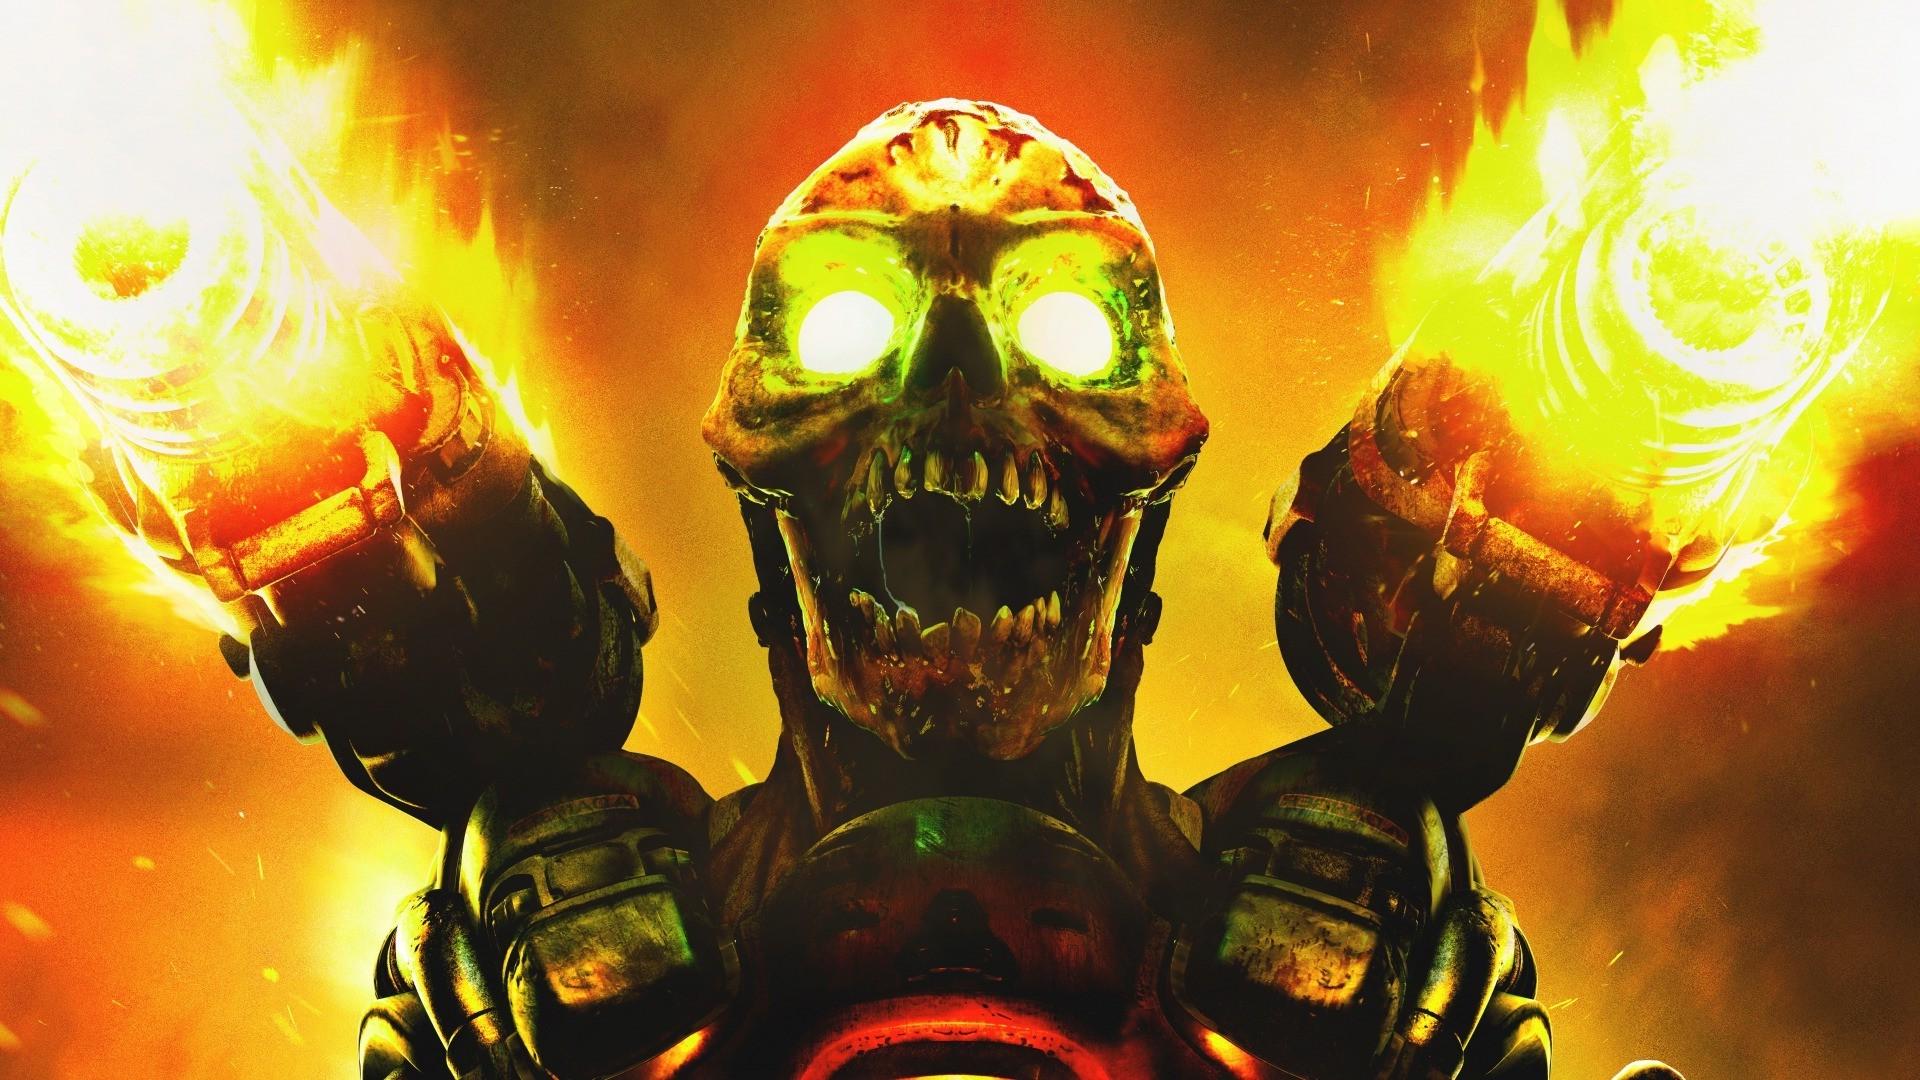 Wallpaper Video Games Doom 4 Bethesda Softworks Id